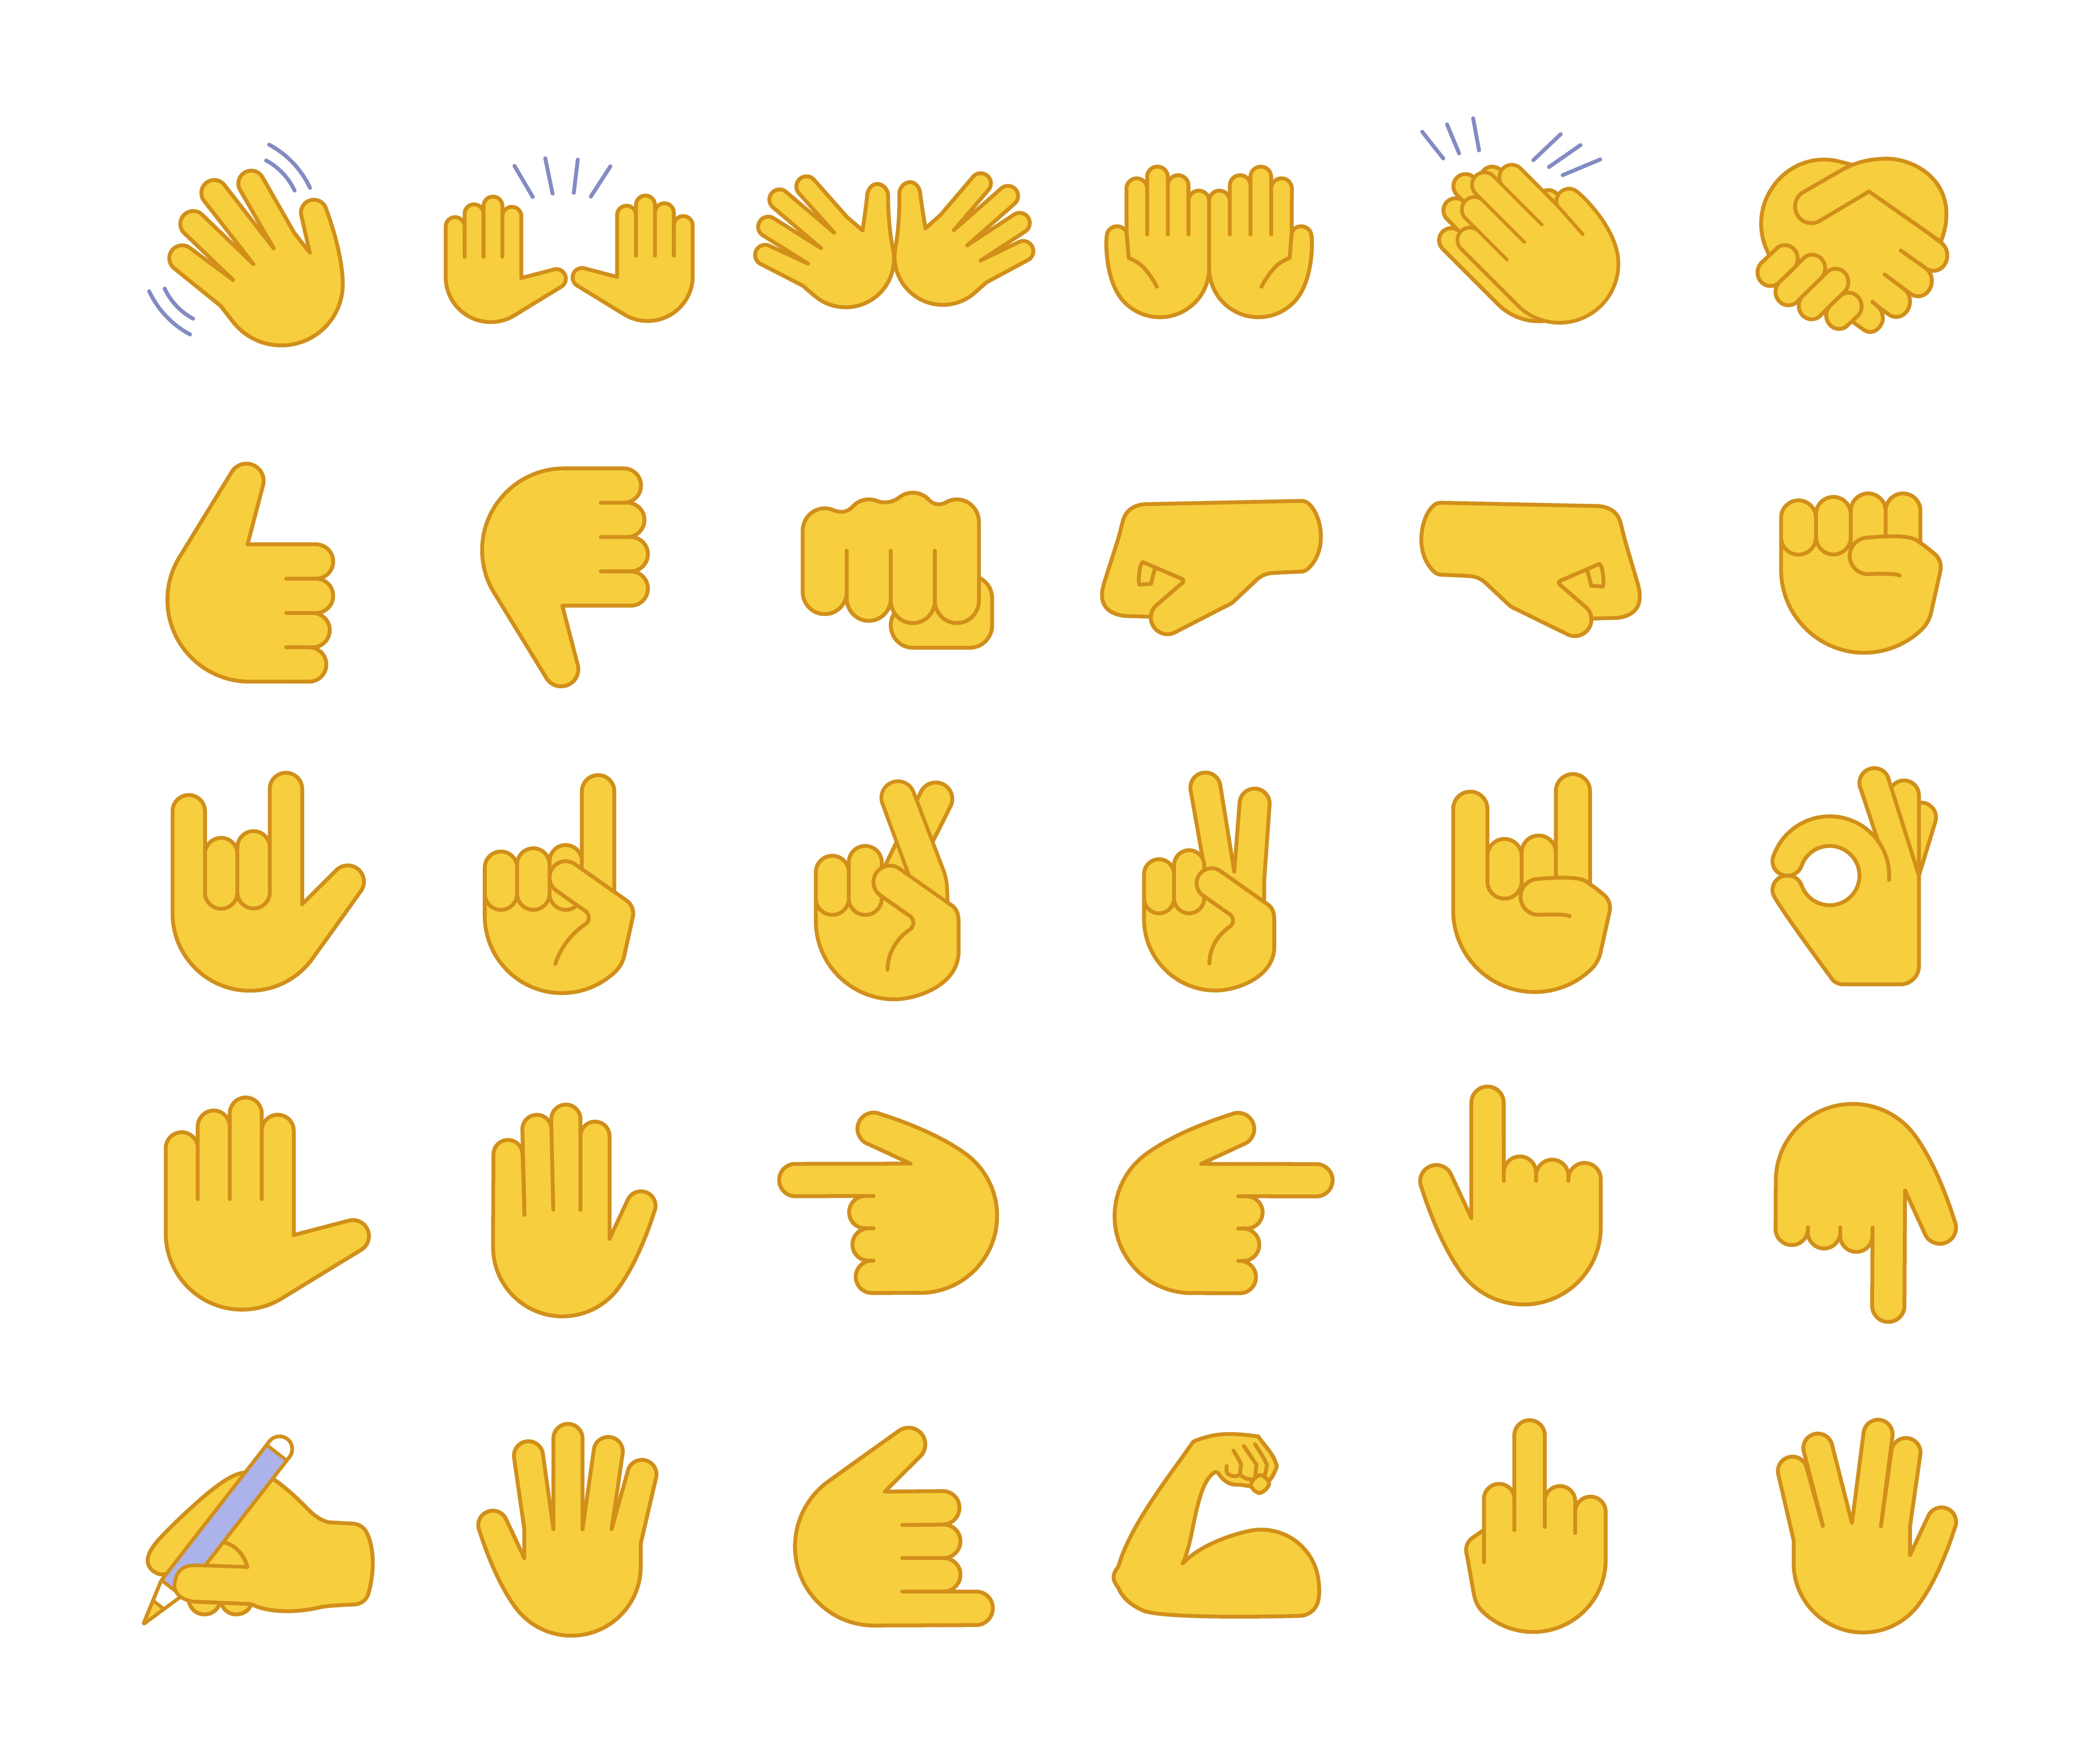 Hands gestures emoji blue 1